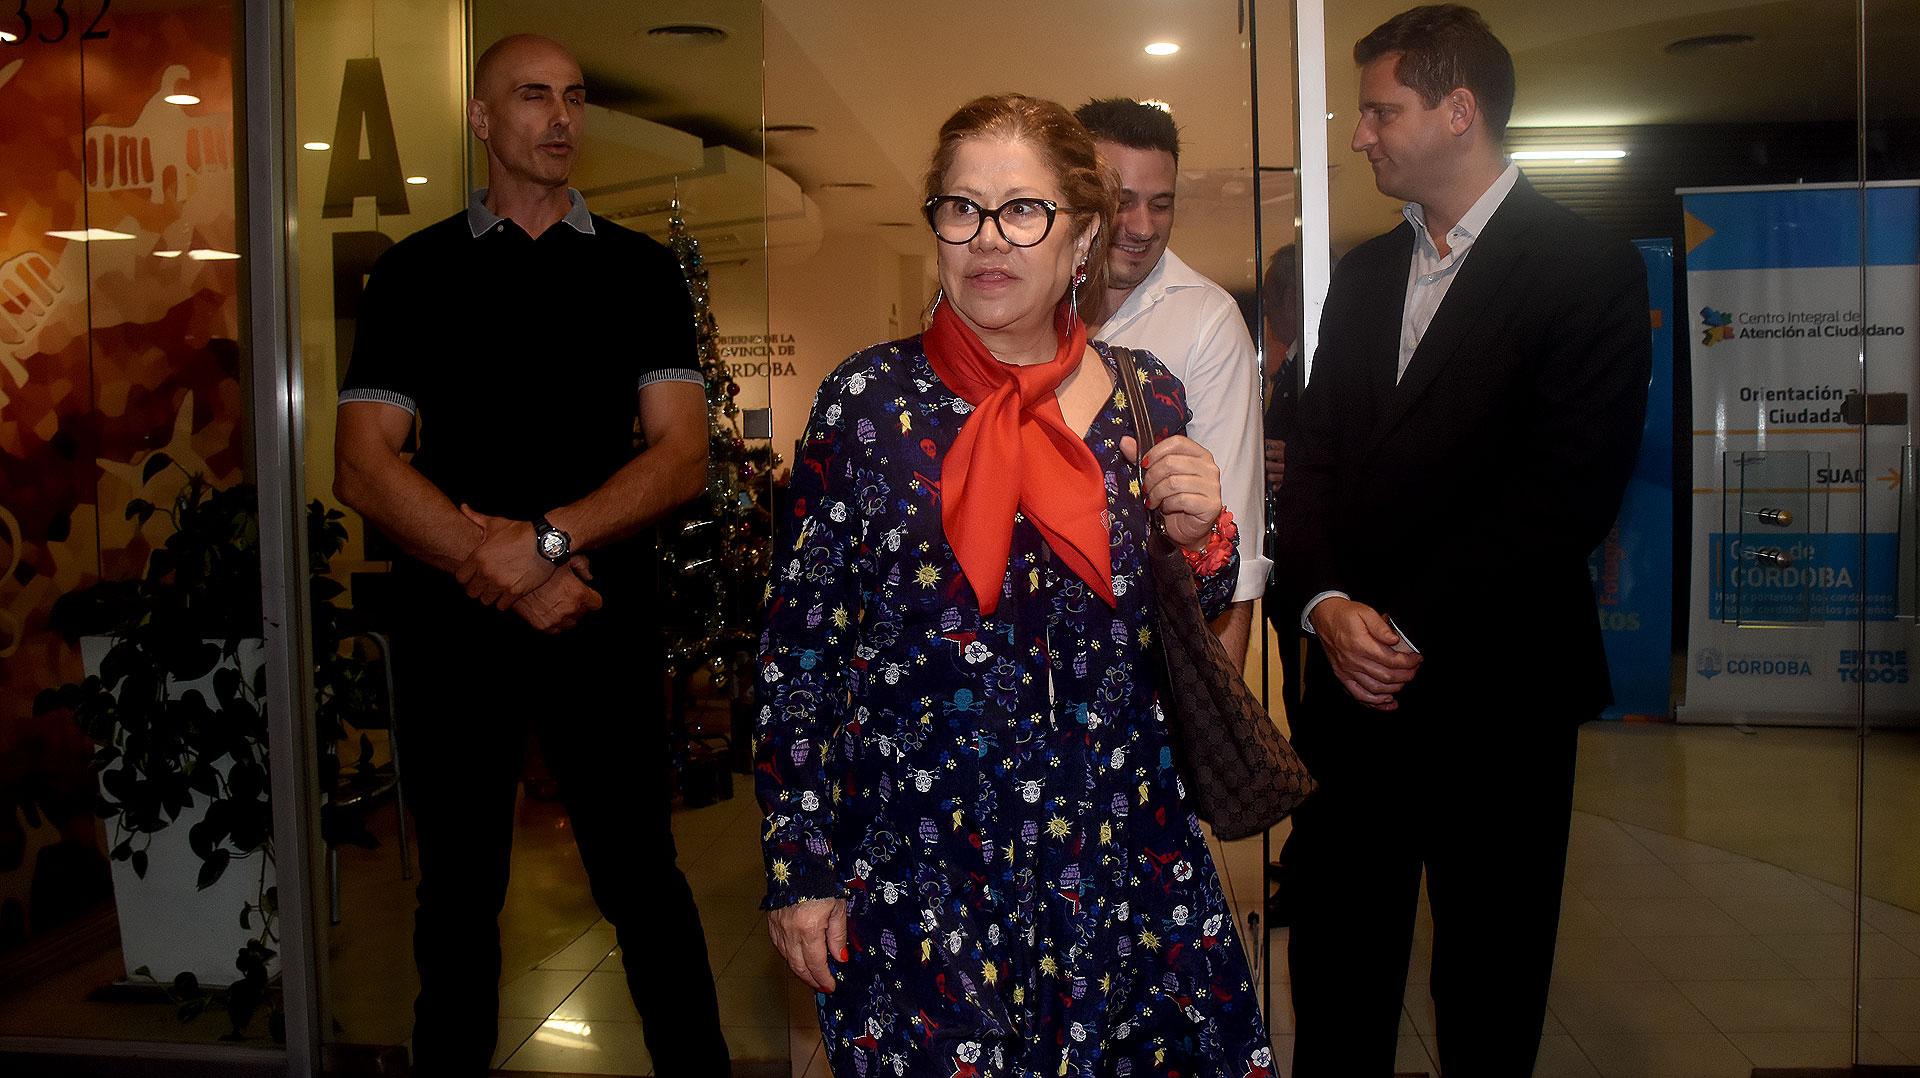 La diputada Graciela Camaño